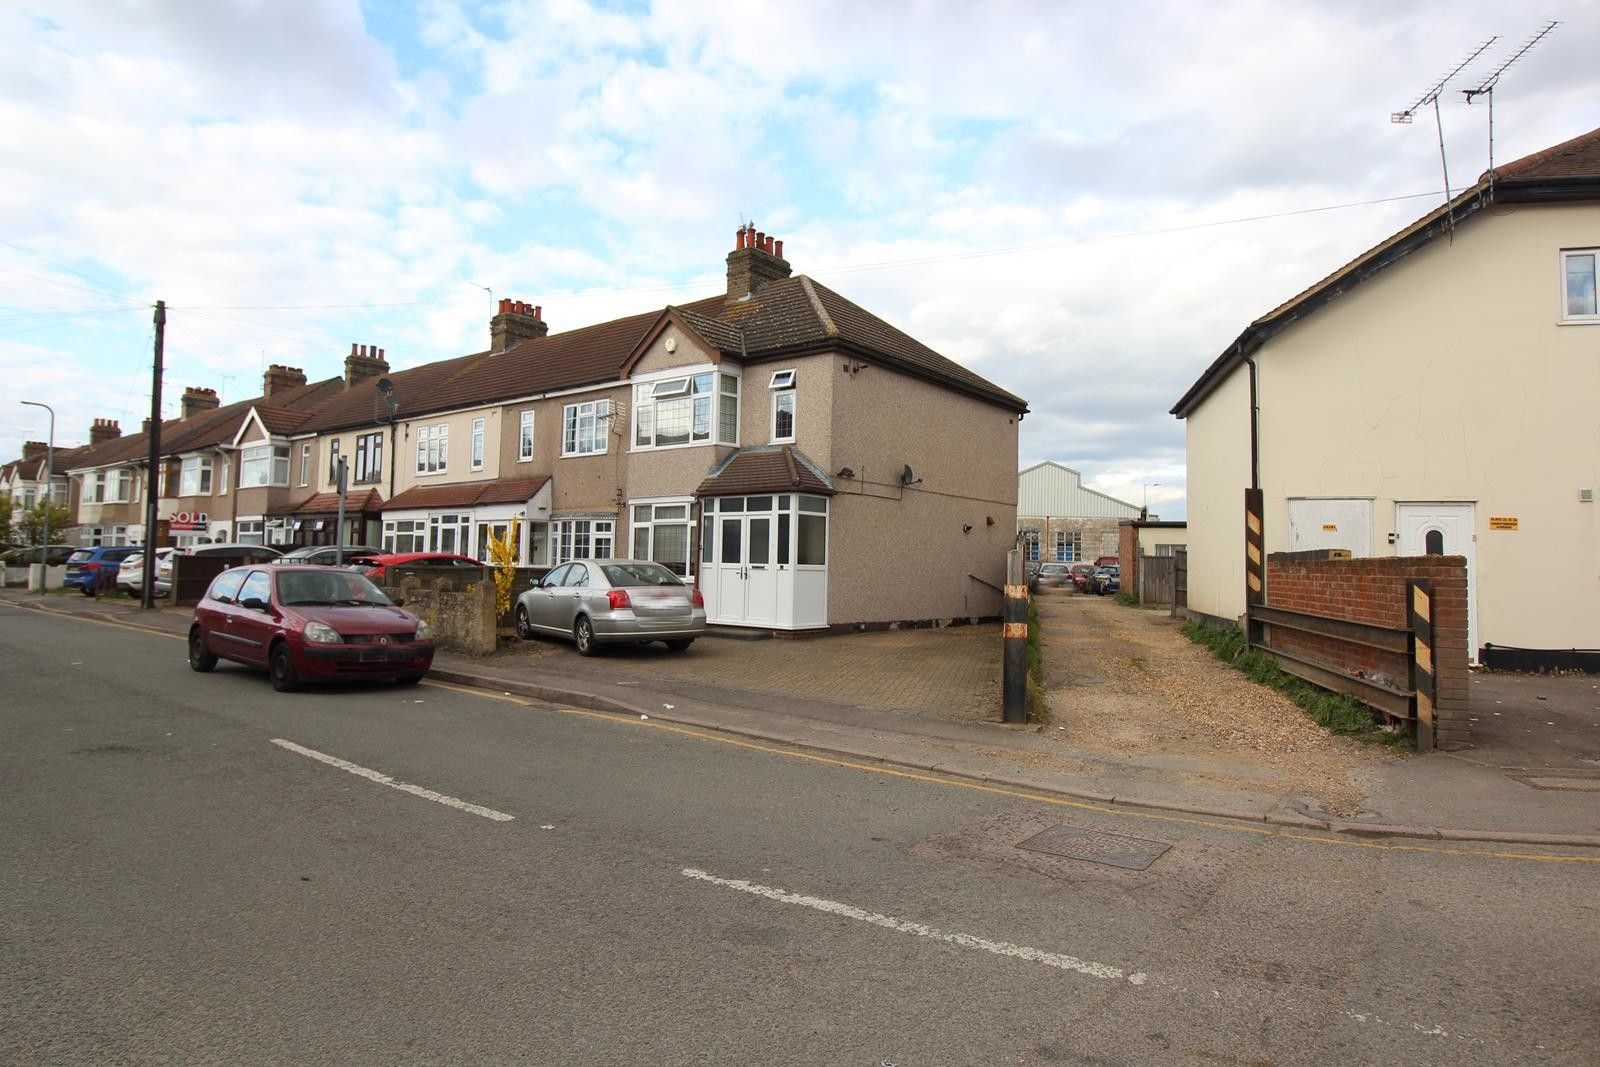 Property photo 1 of 9. Exterior (Main)